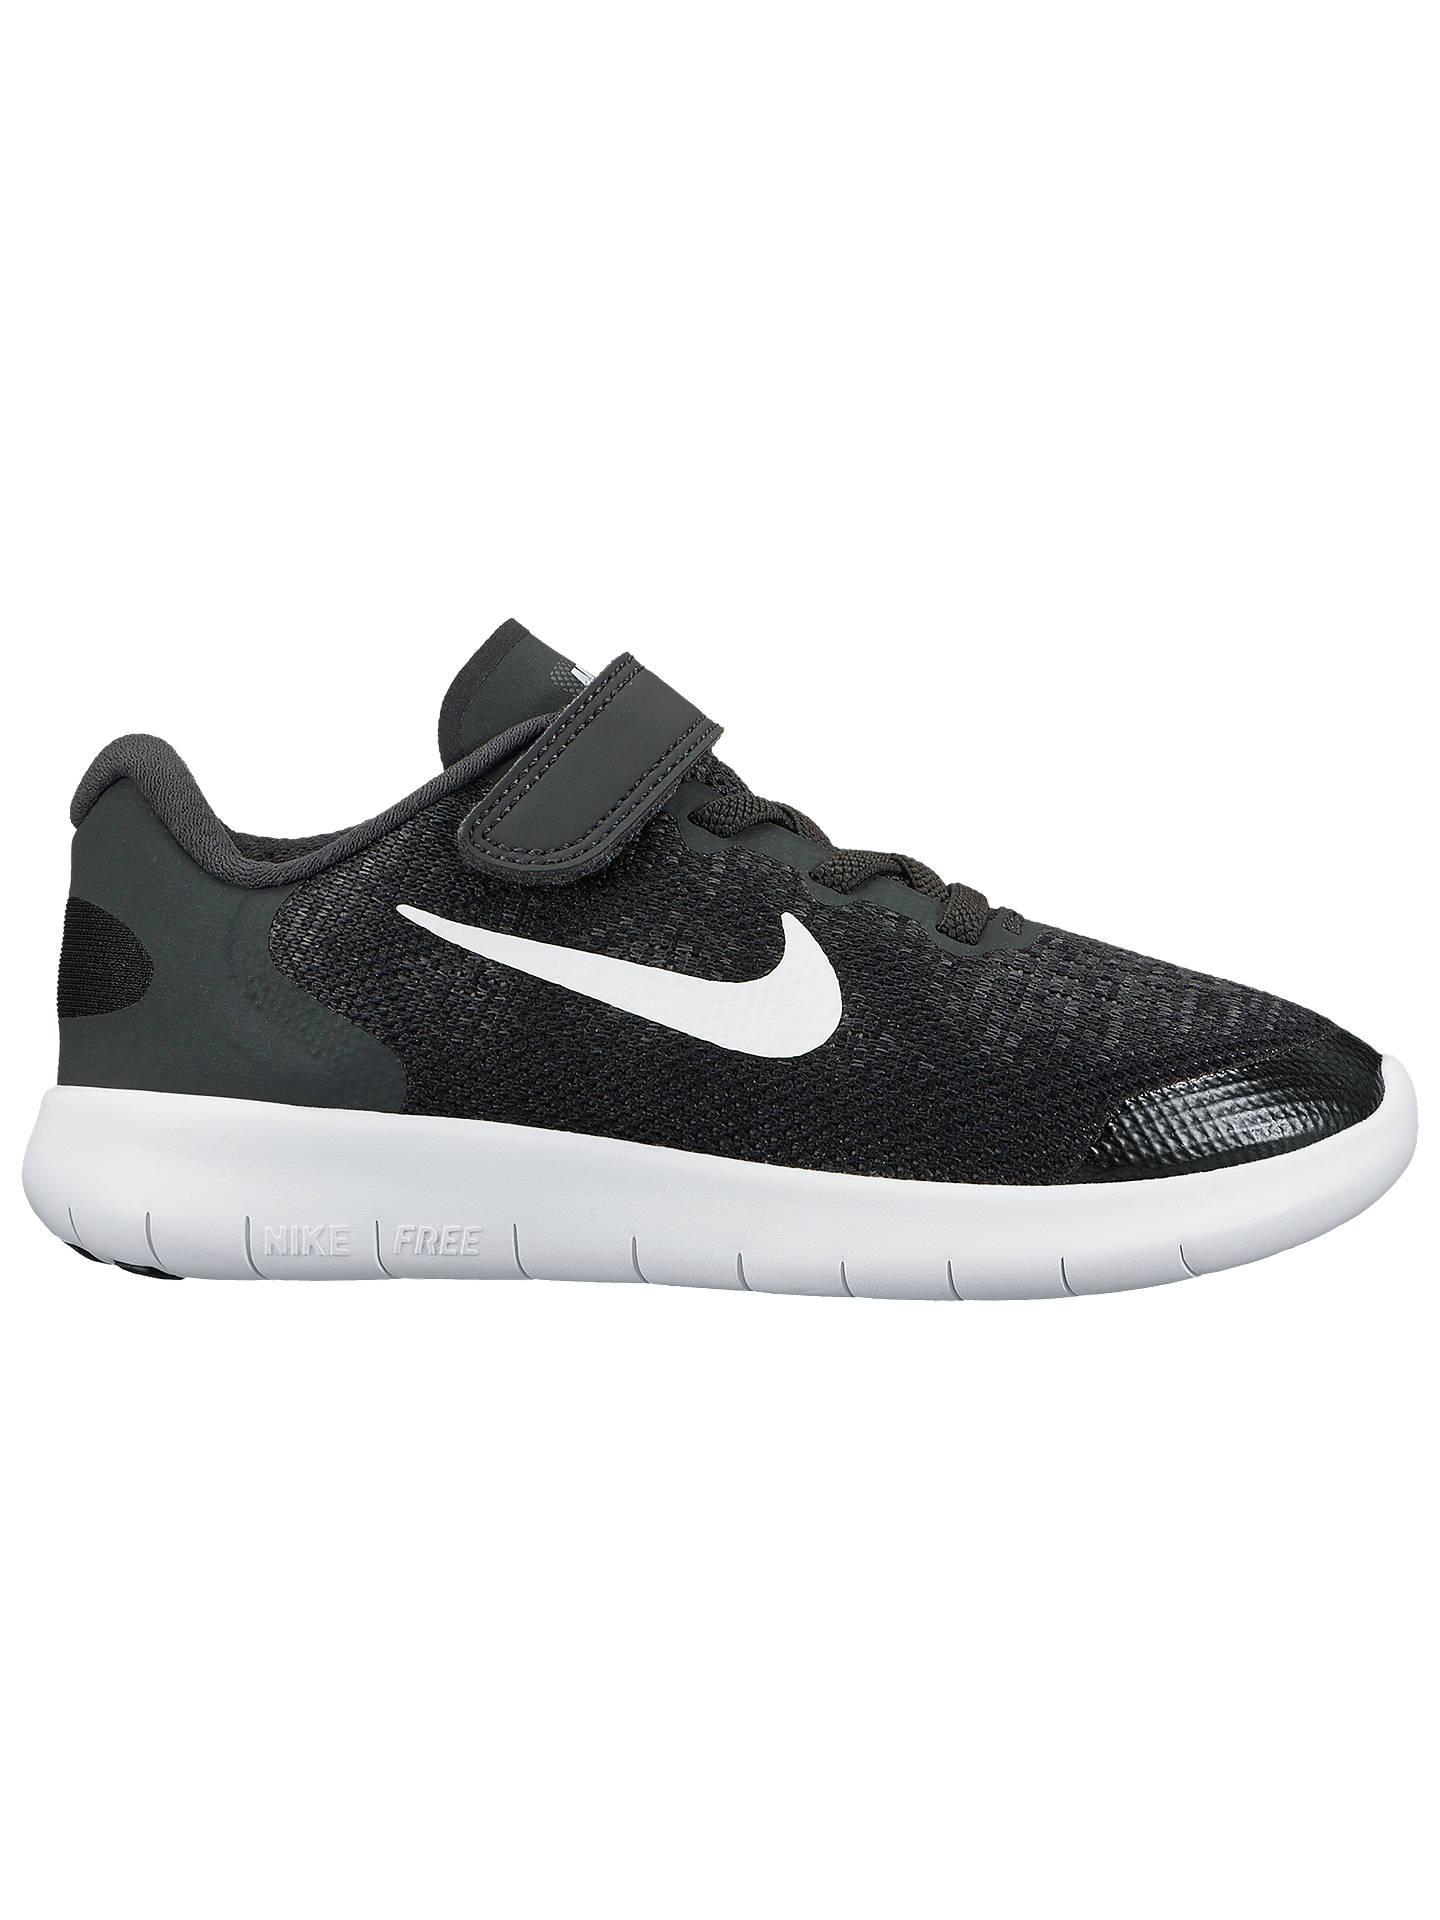 1c860d09955e ... Buy Nike Children s Free Run 2 PS Riptape Trainers